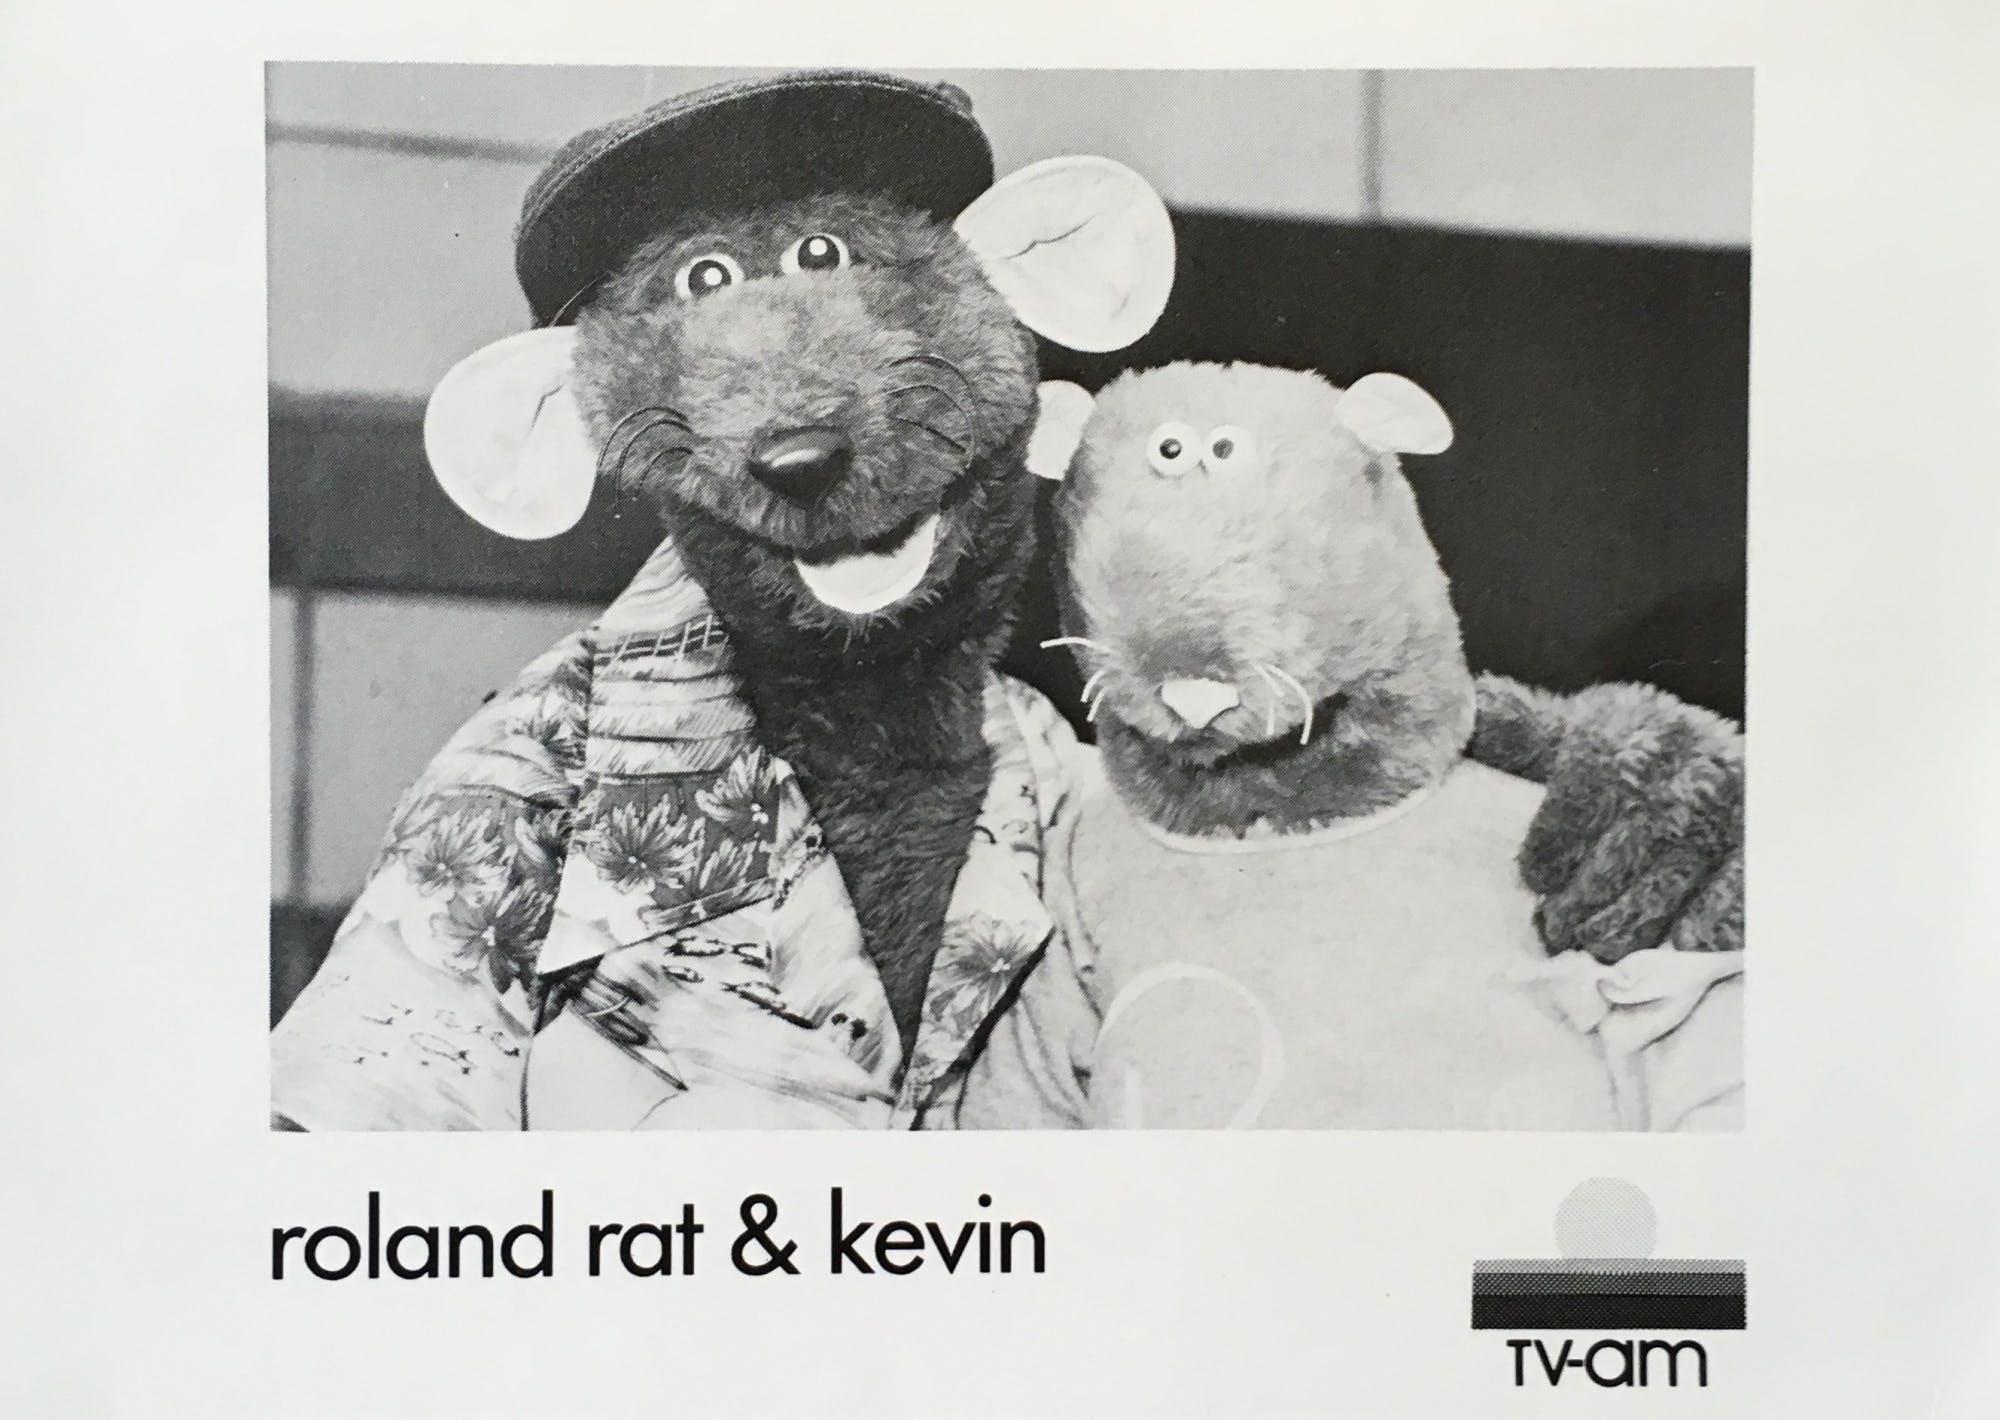 Roland Rat & Kevin the Gerbil